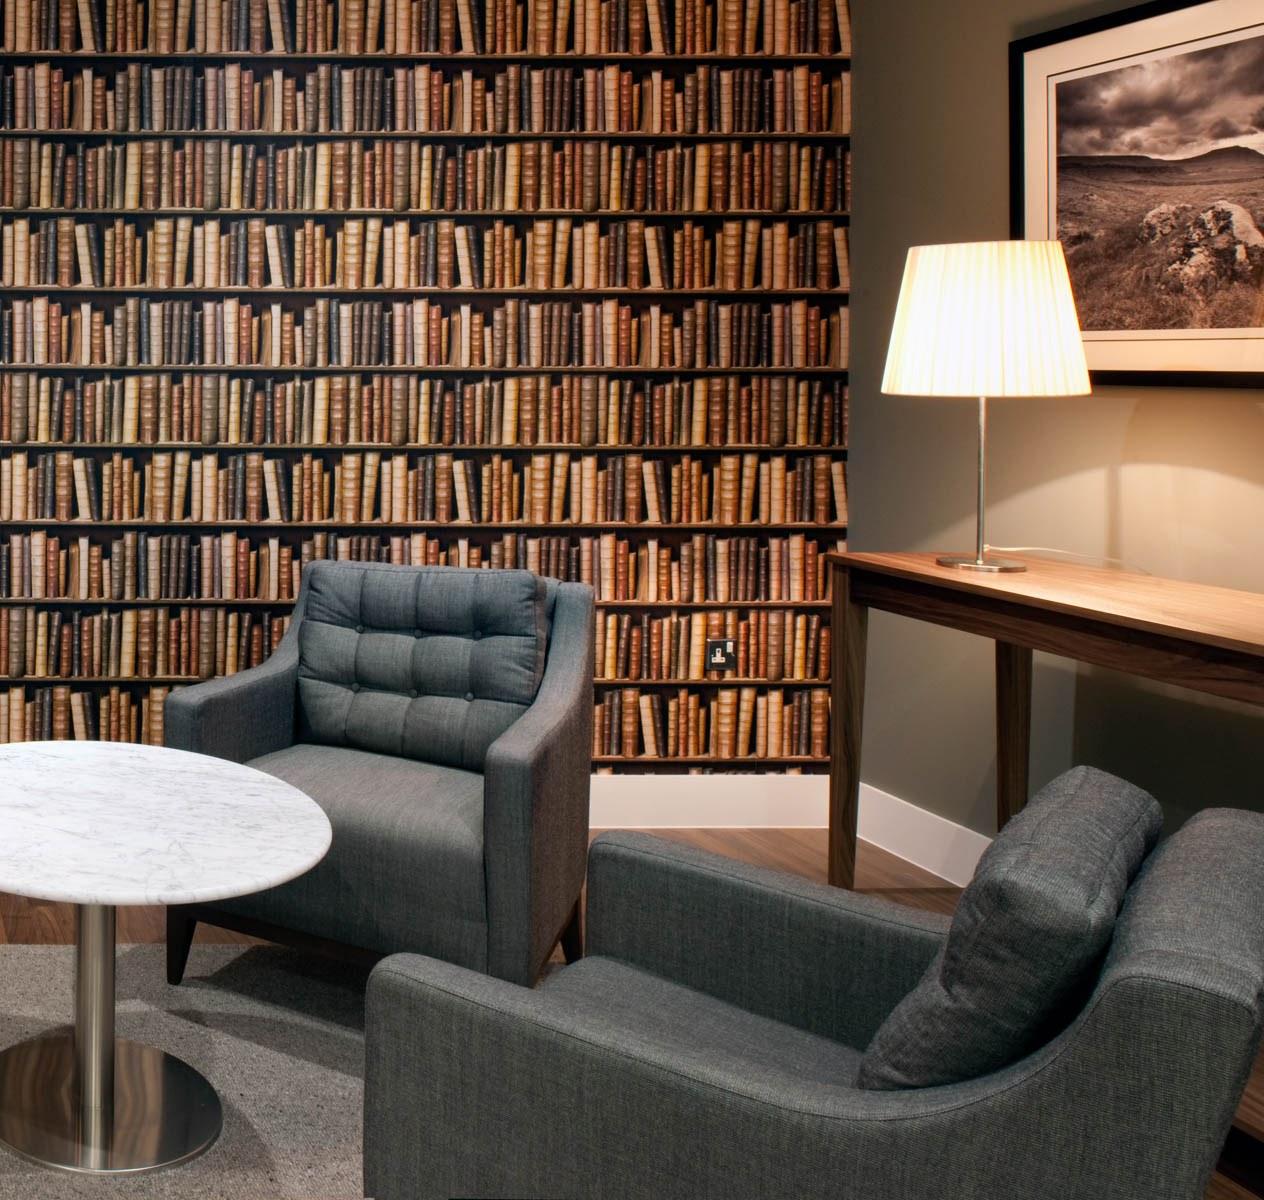 Nuffield Health office interior design